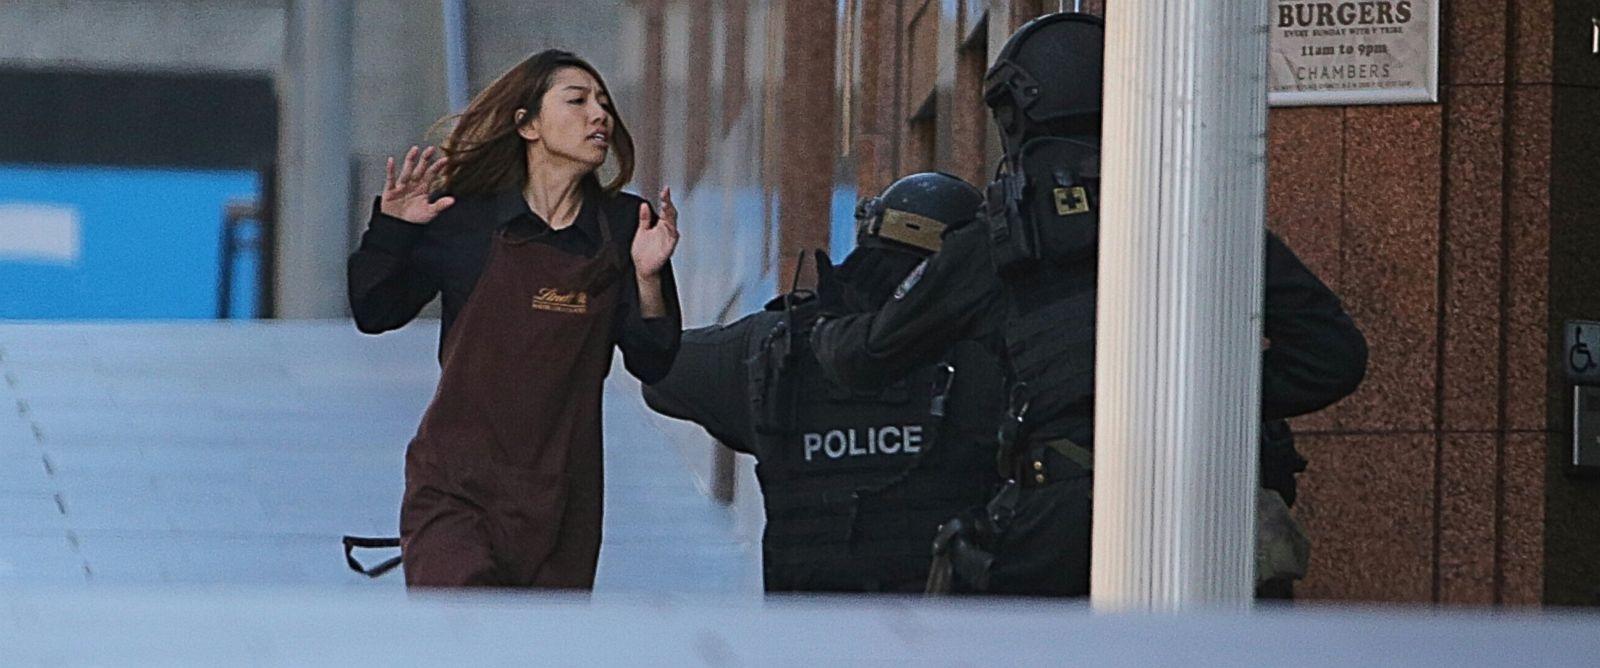 sydney news abc local - photo#10